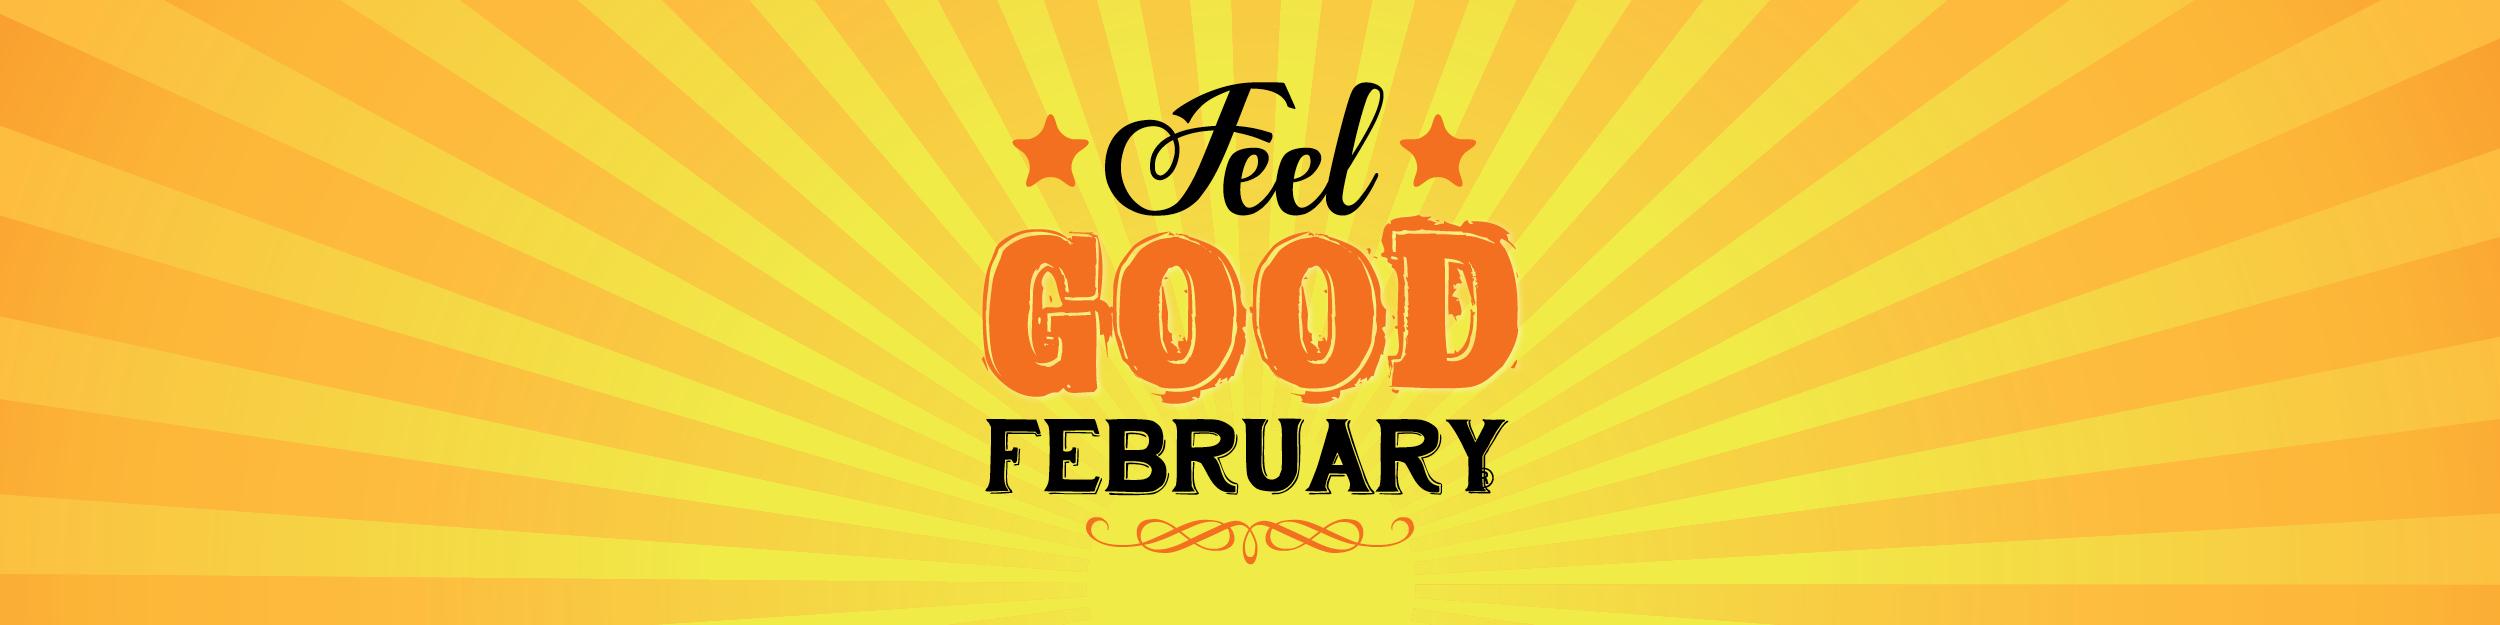 Feel Good Feb